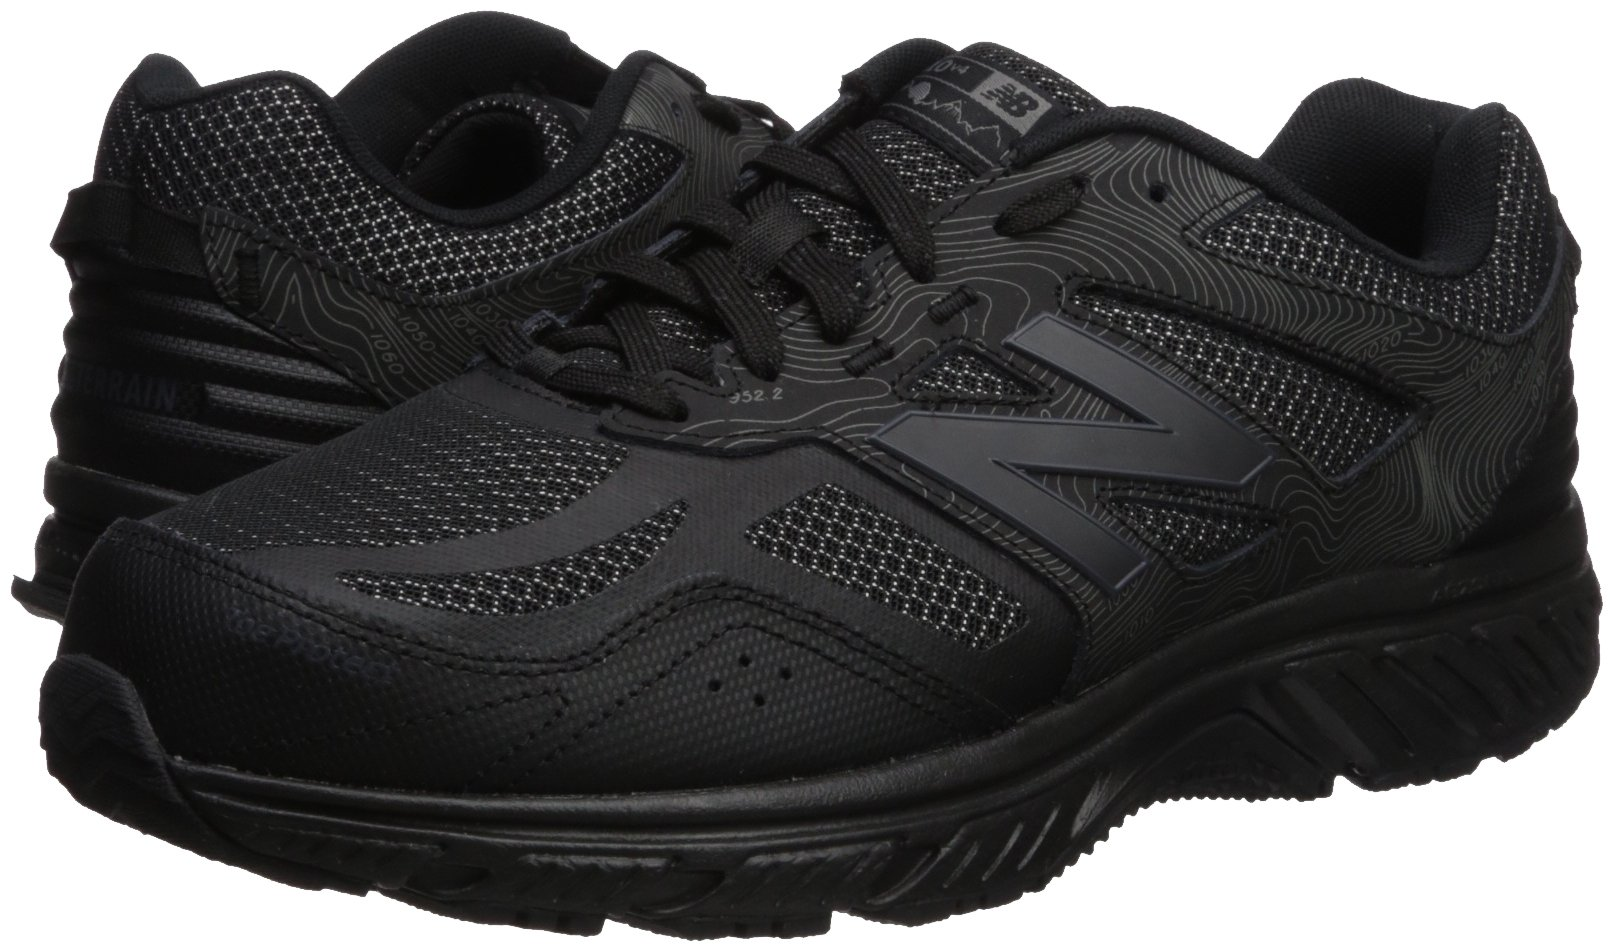 New Balance Men's 510v4 Cushioning Trail Running Shoe, Black, 7 D US by New Balance (Image #6)